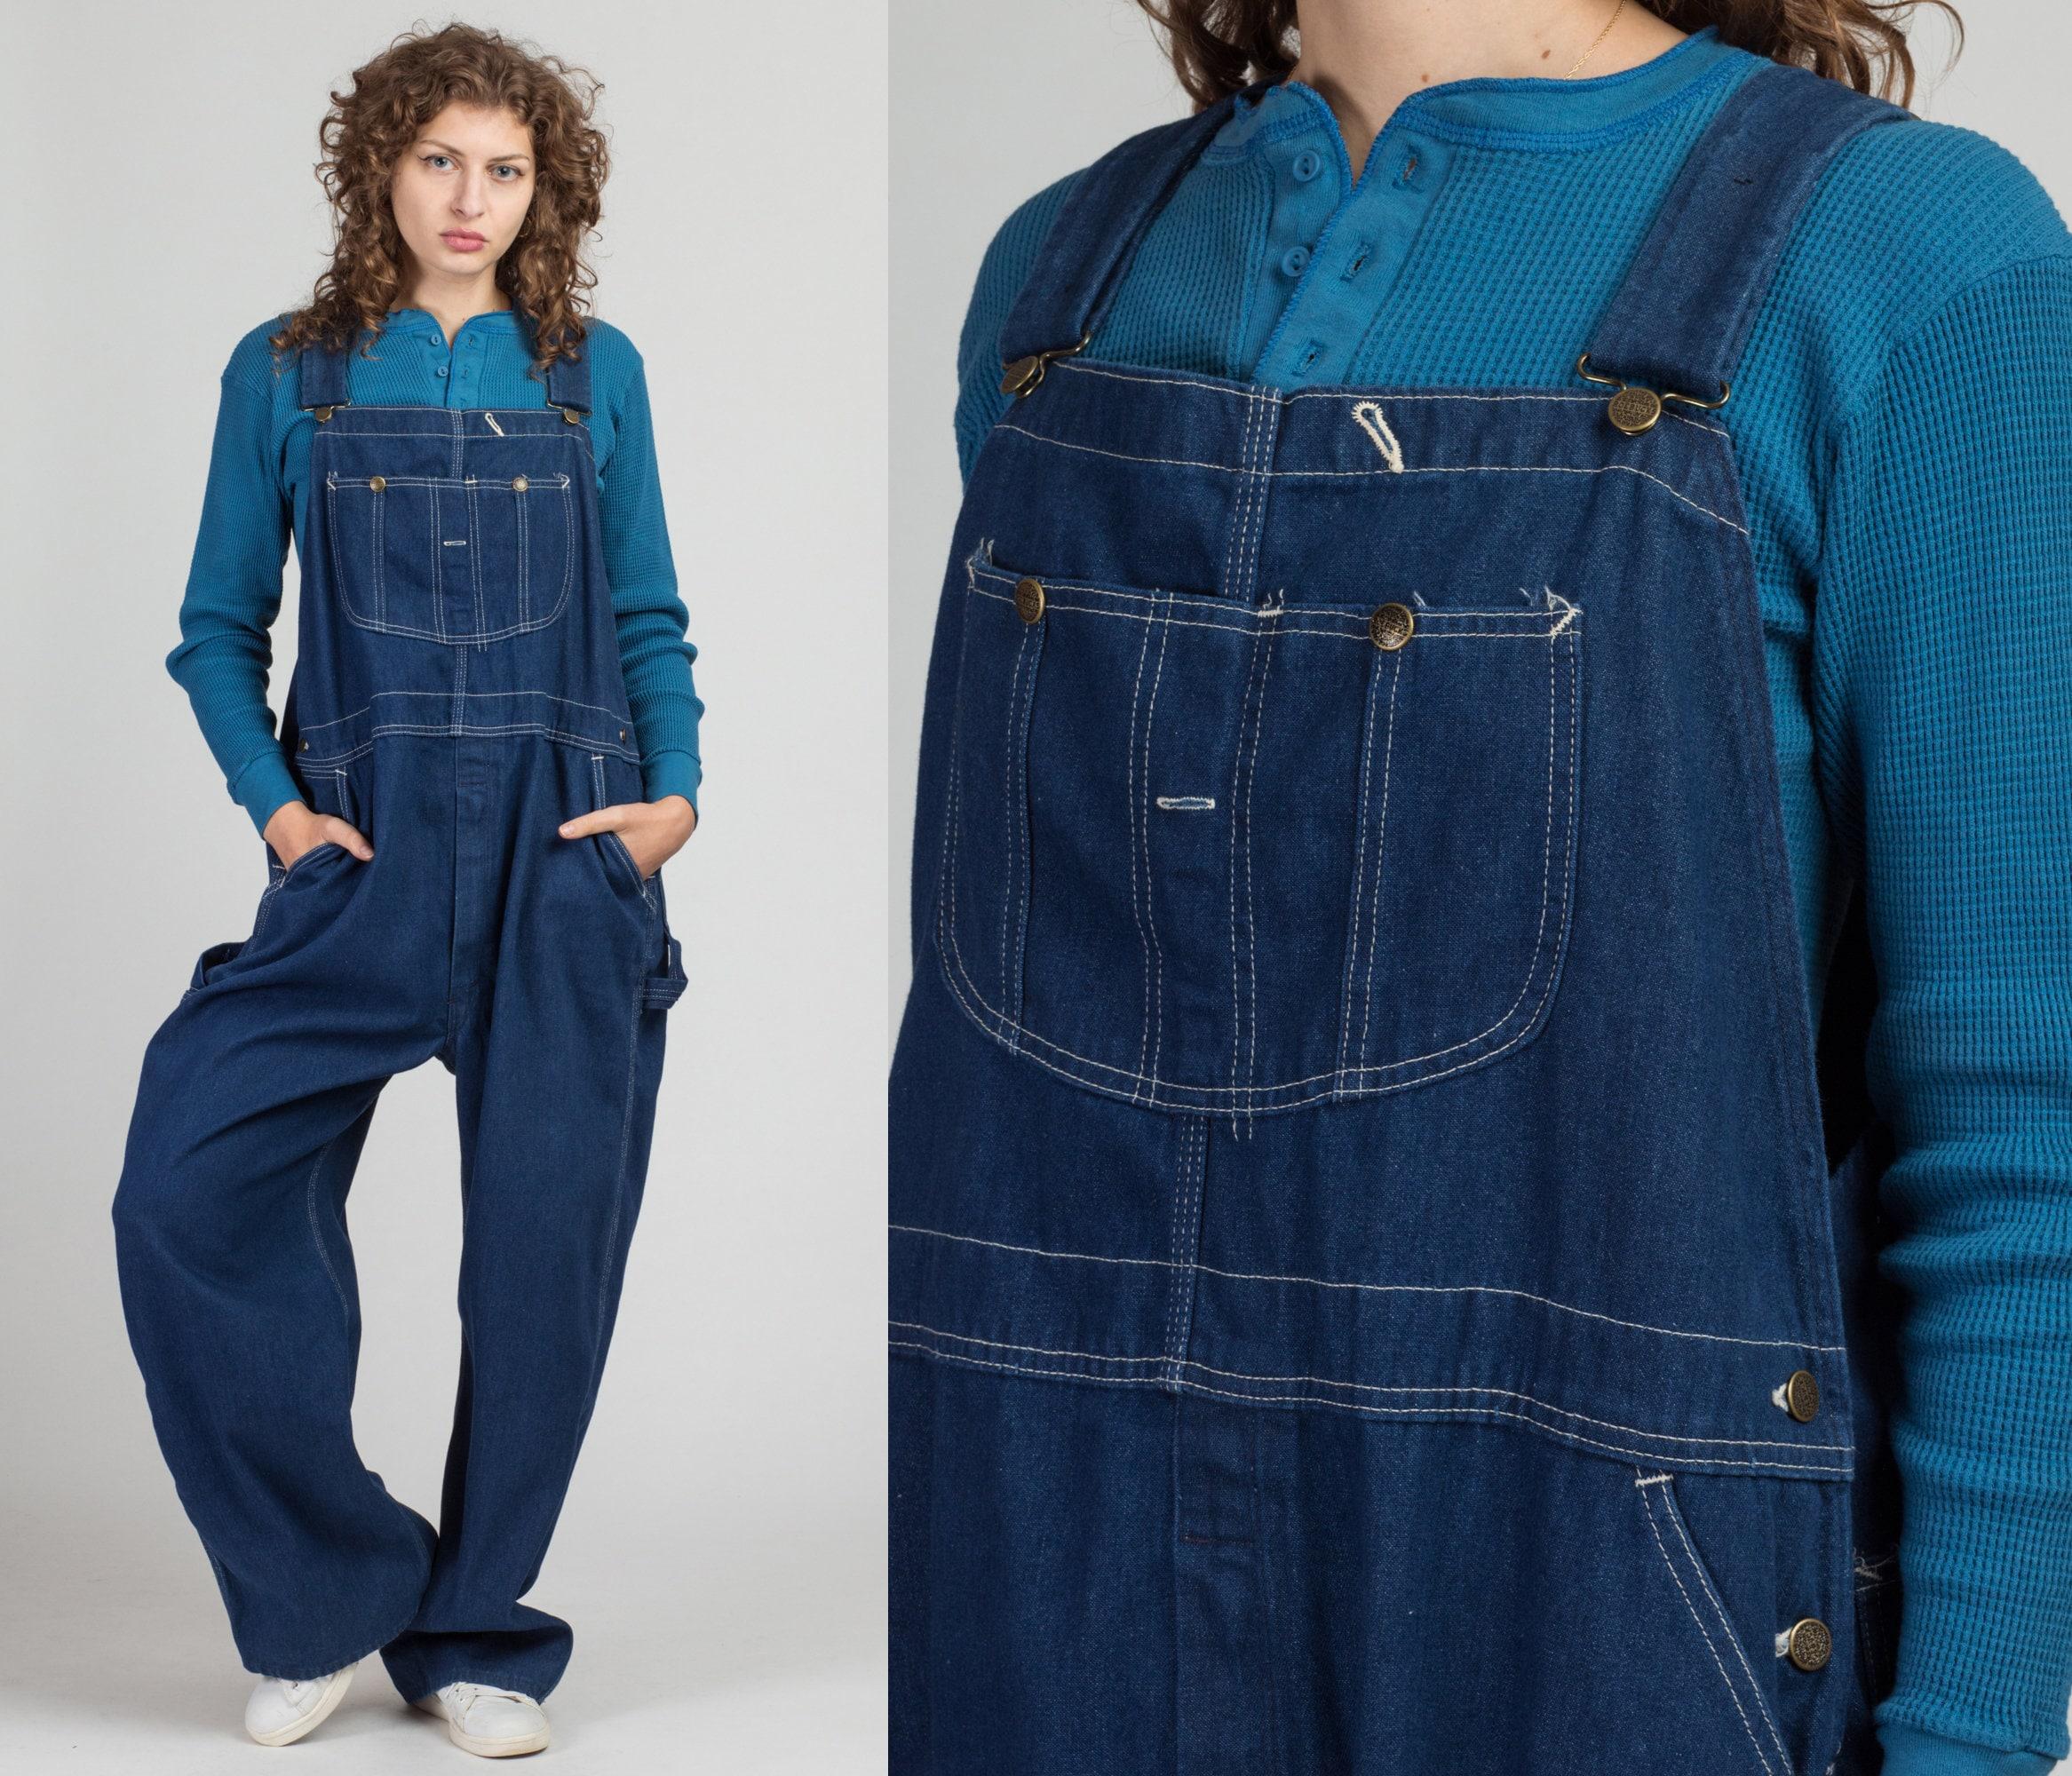 Vintage Overalls & Jumpsuits Vintage Sears Weartuff Overalls - Mens 2xl  80S Unisex Denim Bib Overall Pants Workwear Dungarees $34.95 AT vintagedancer.com